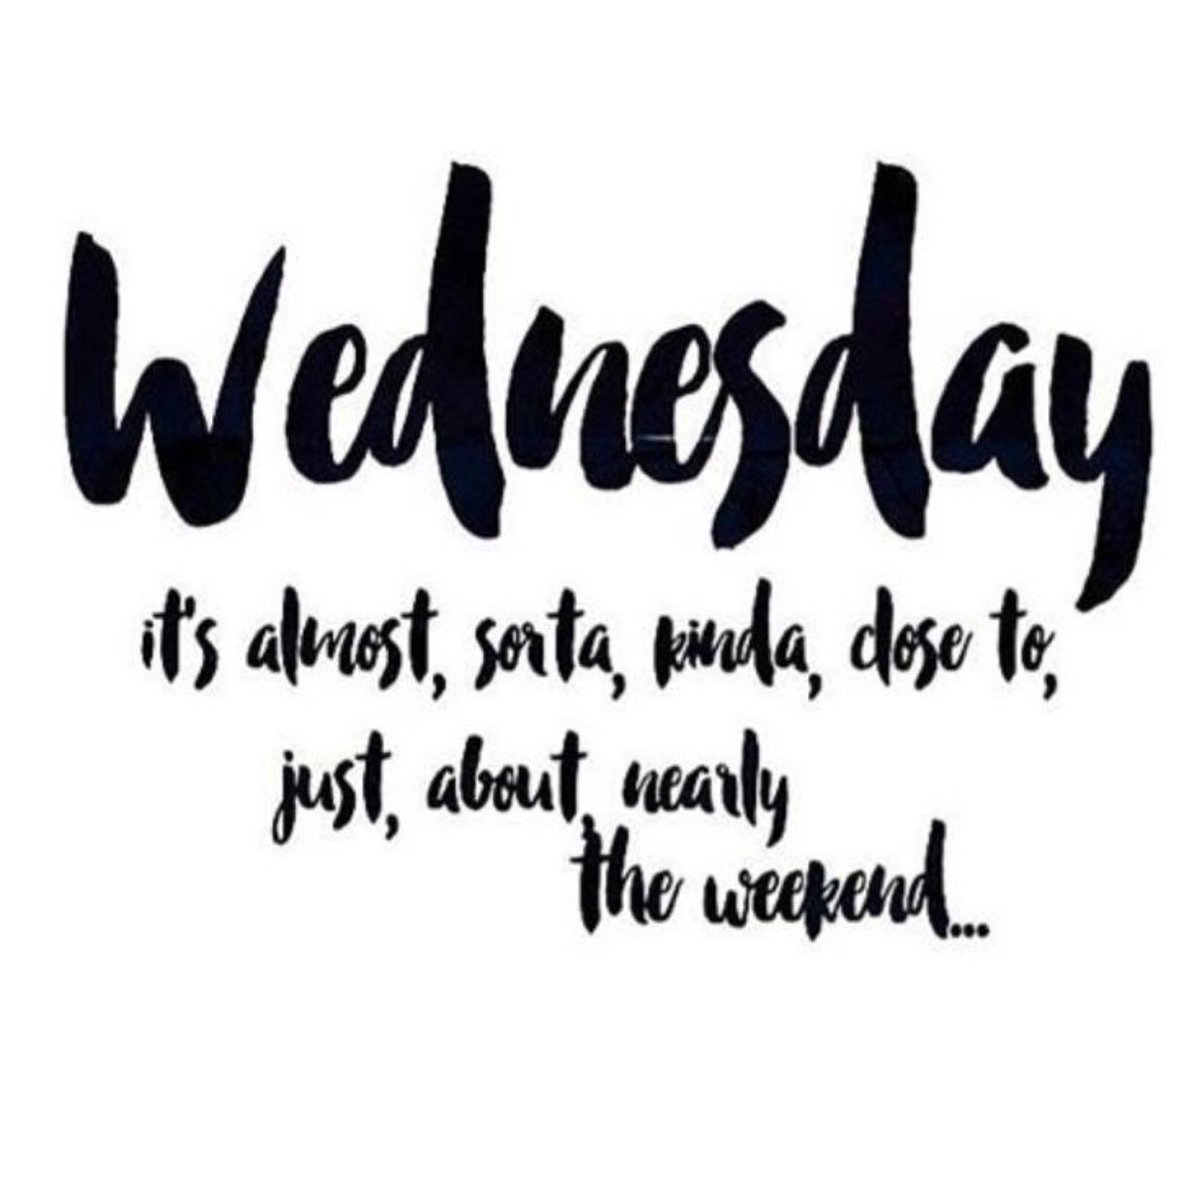 About nearly the weekend   #goodmorning #happywednesday #enjoyyourday #behappy #felizmiercoles #serfeliz #coffeetime #euniverz #buenosdias <br>http://pic.twitter.com/U5bc7Ofsx5